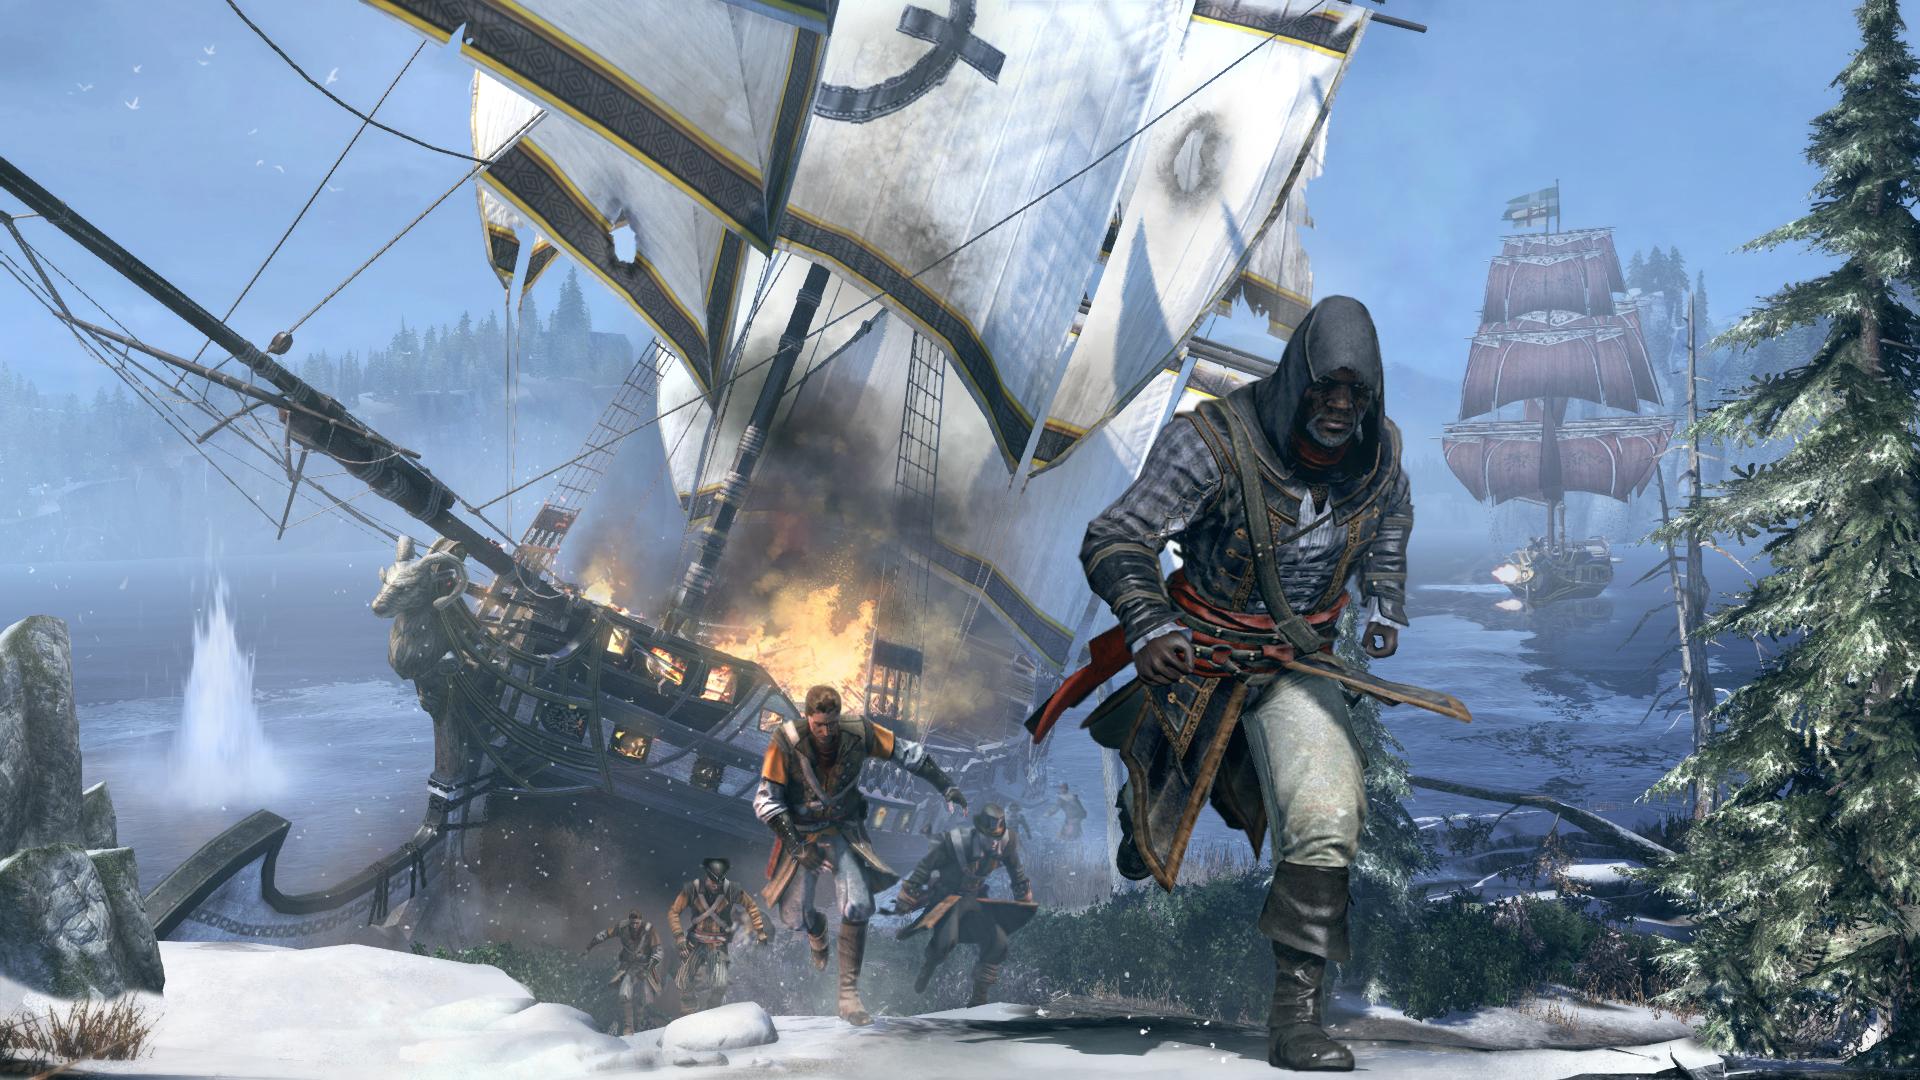 Assassin's Creed Rogue Screens & Artworks